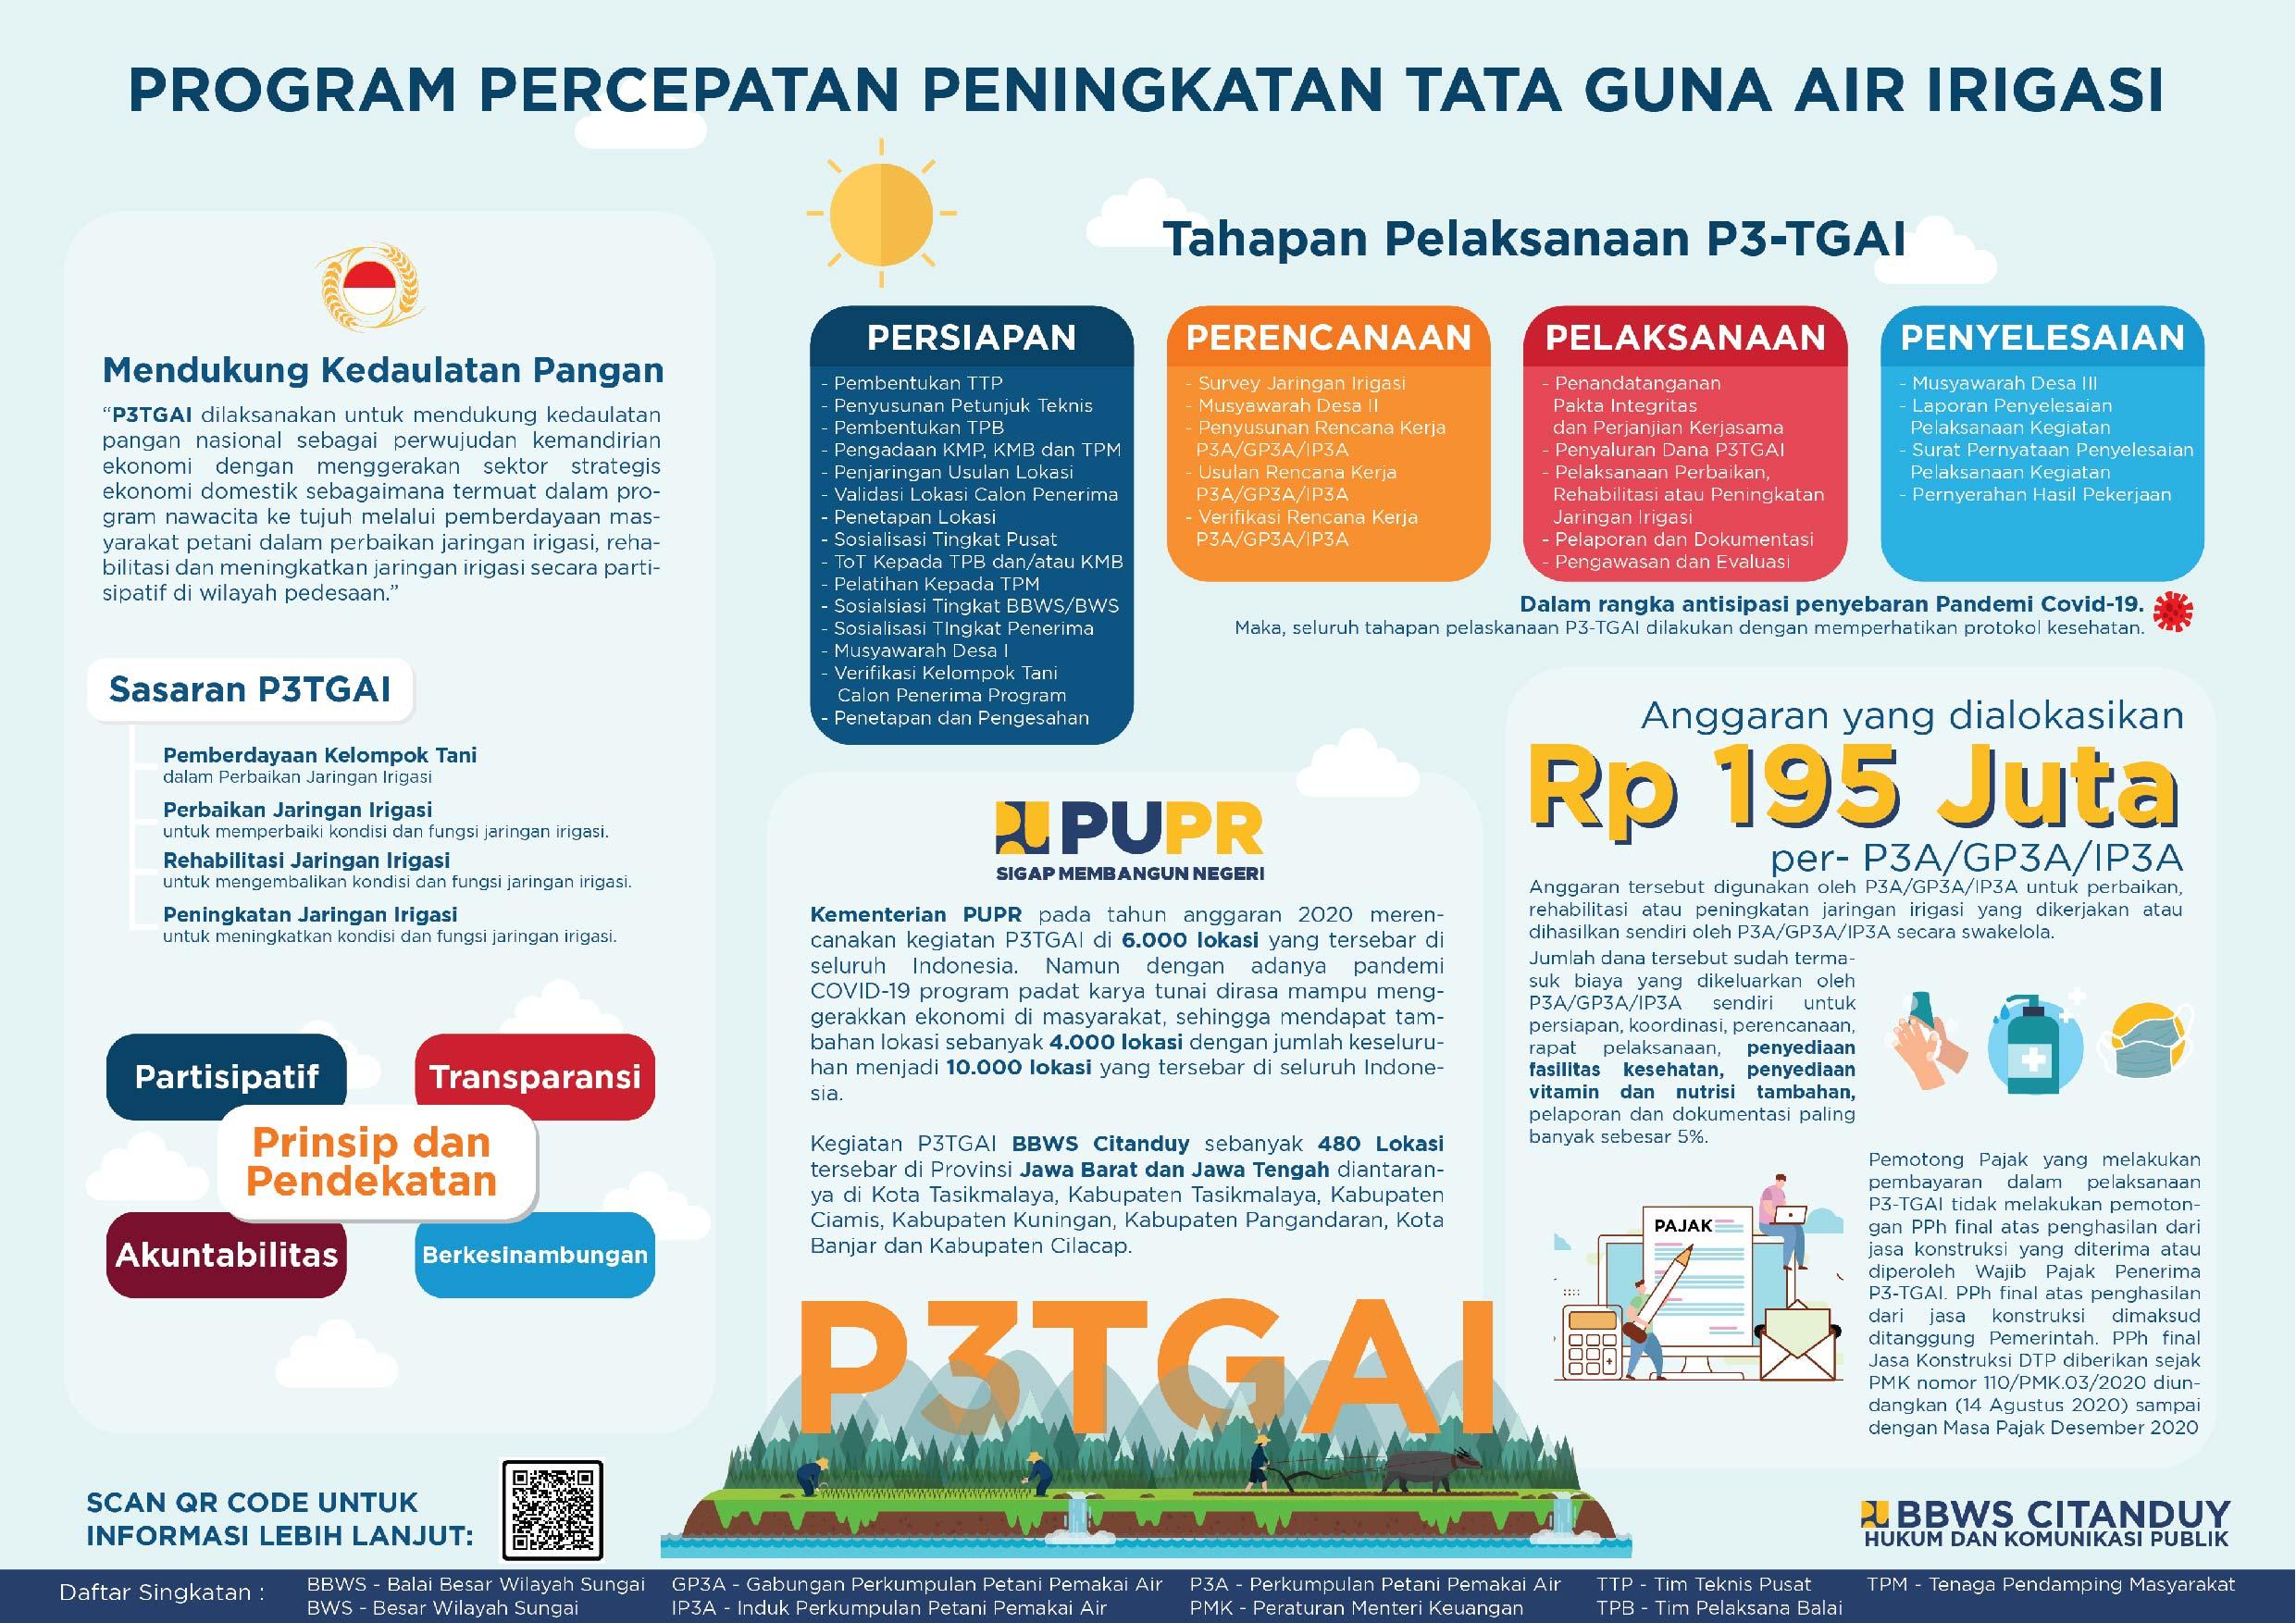 Infografis Program Percepatan Peningkatan Tata Guna Air Irigasi (P3-TGAI)